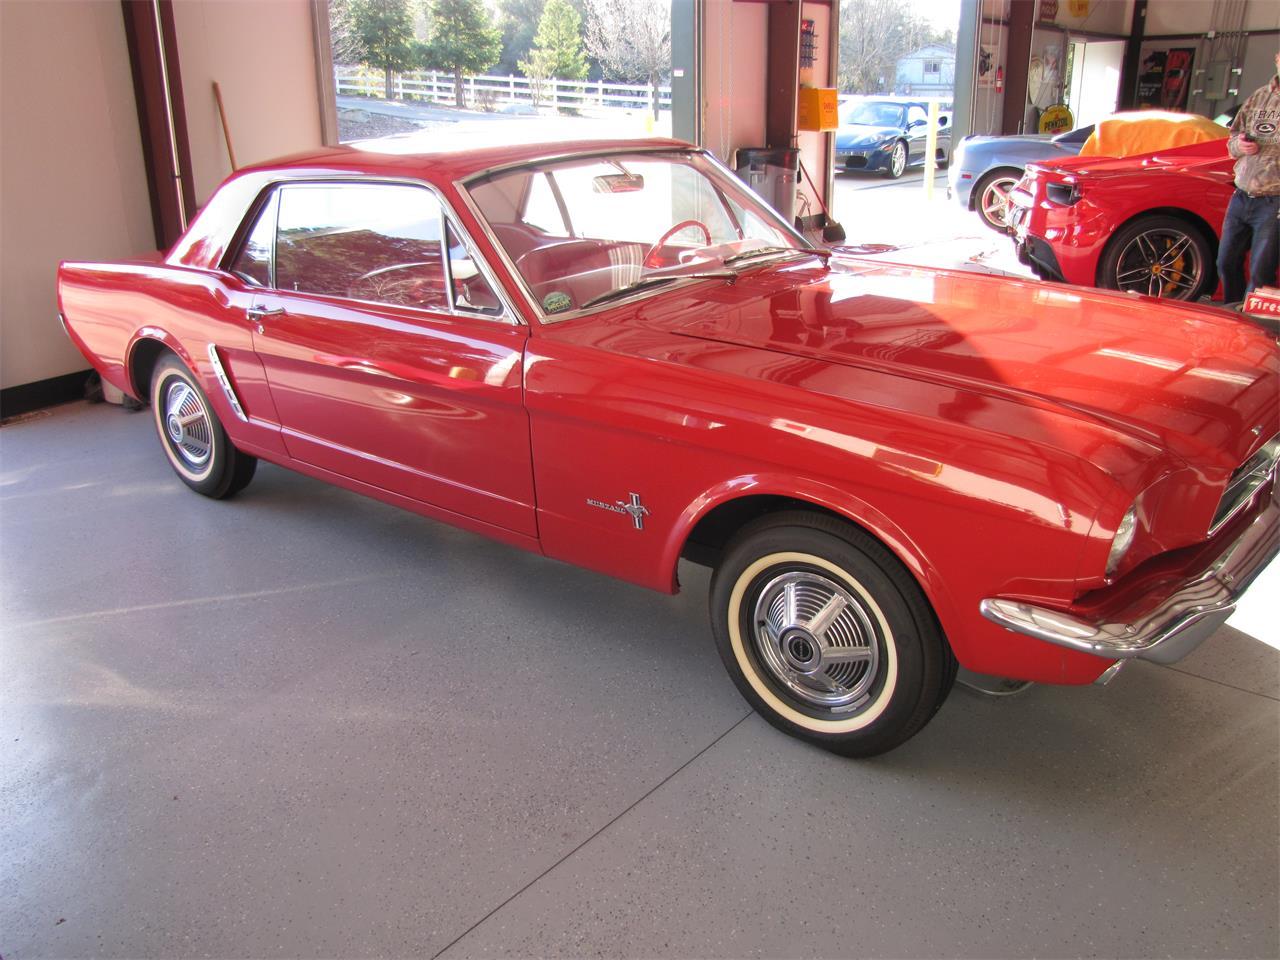 1965 Ford Mustang (CC-1221257) for sale in Granite Bay, California